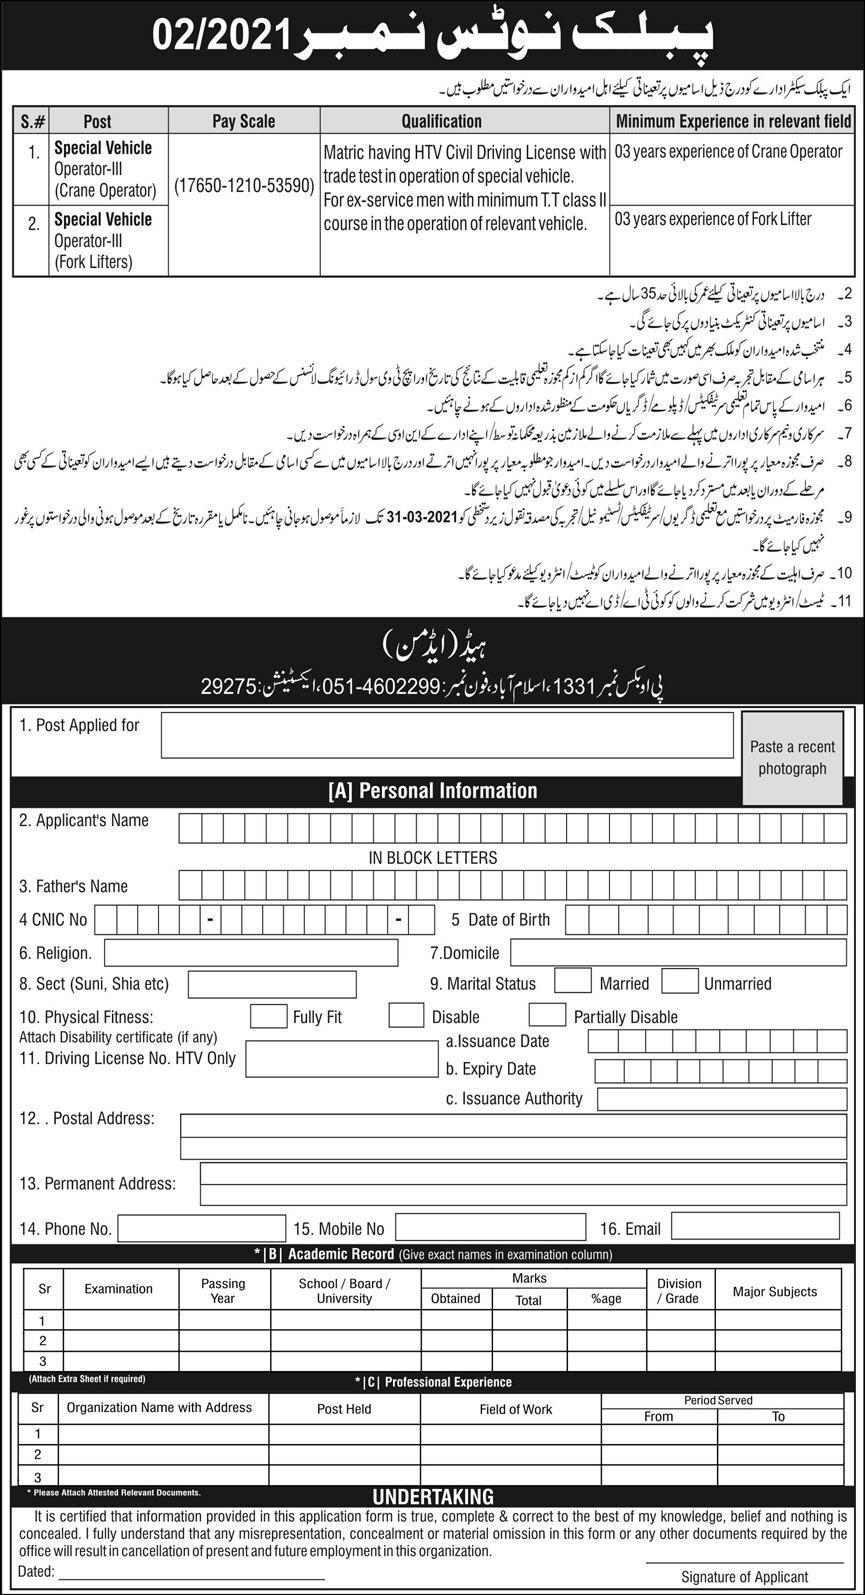 Public Sector Organization PO Box 1331 Islamabad Jobs 2021 Latest Advertisement - Application Form